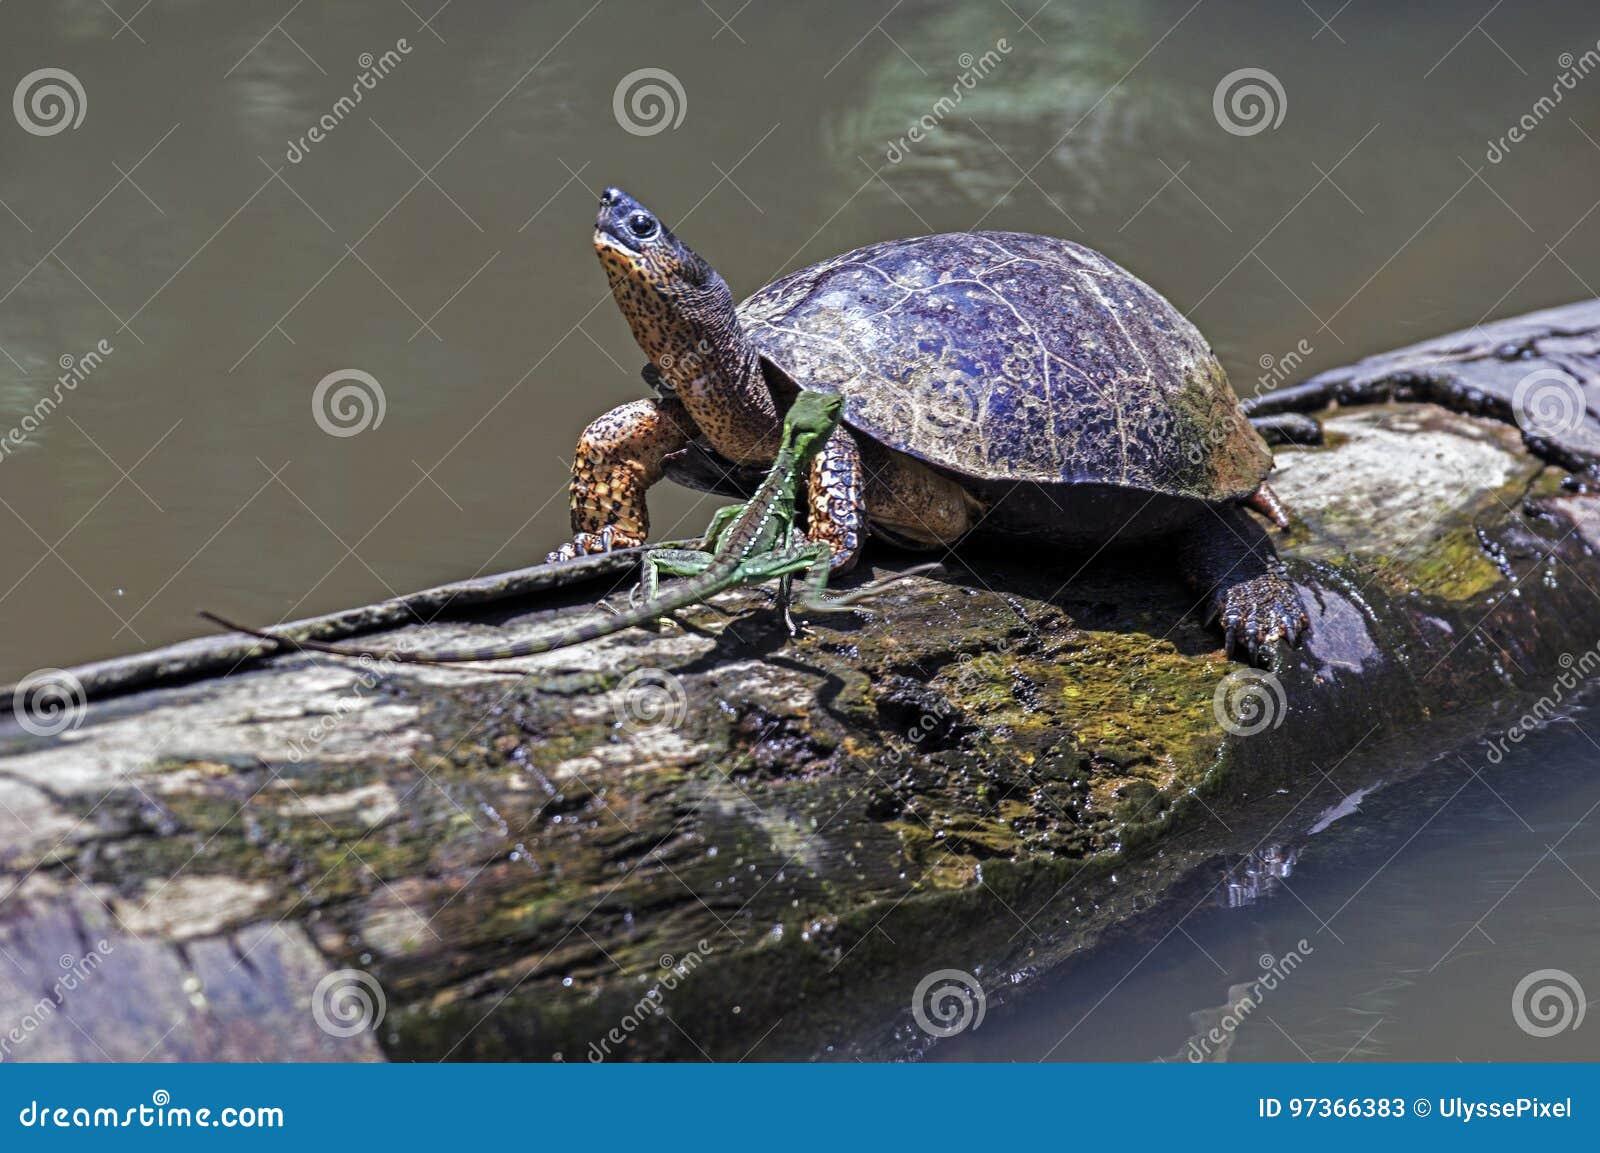 Lagarto e tartaruga running do rio em Tortuguero - Costa Rica